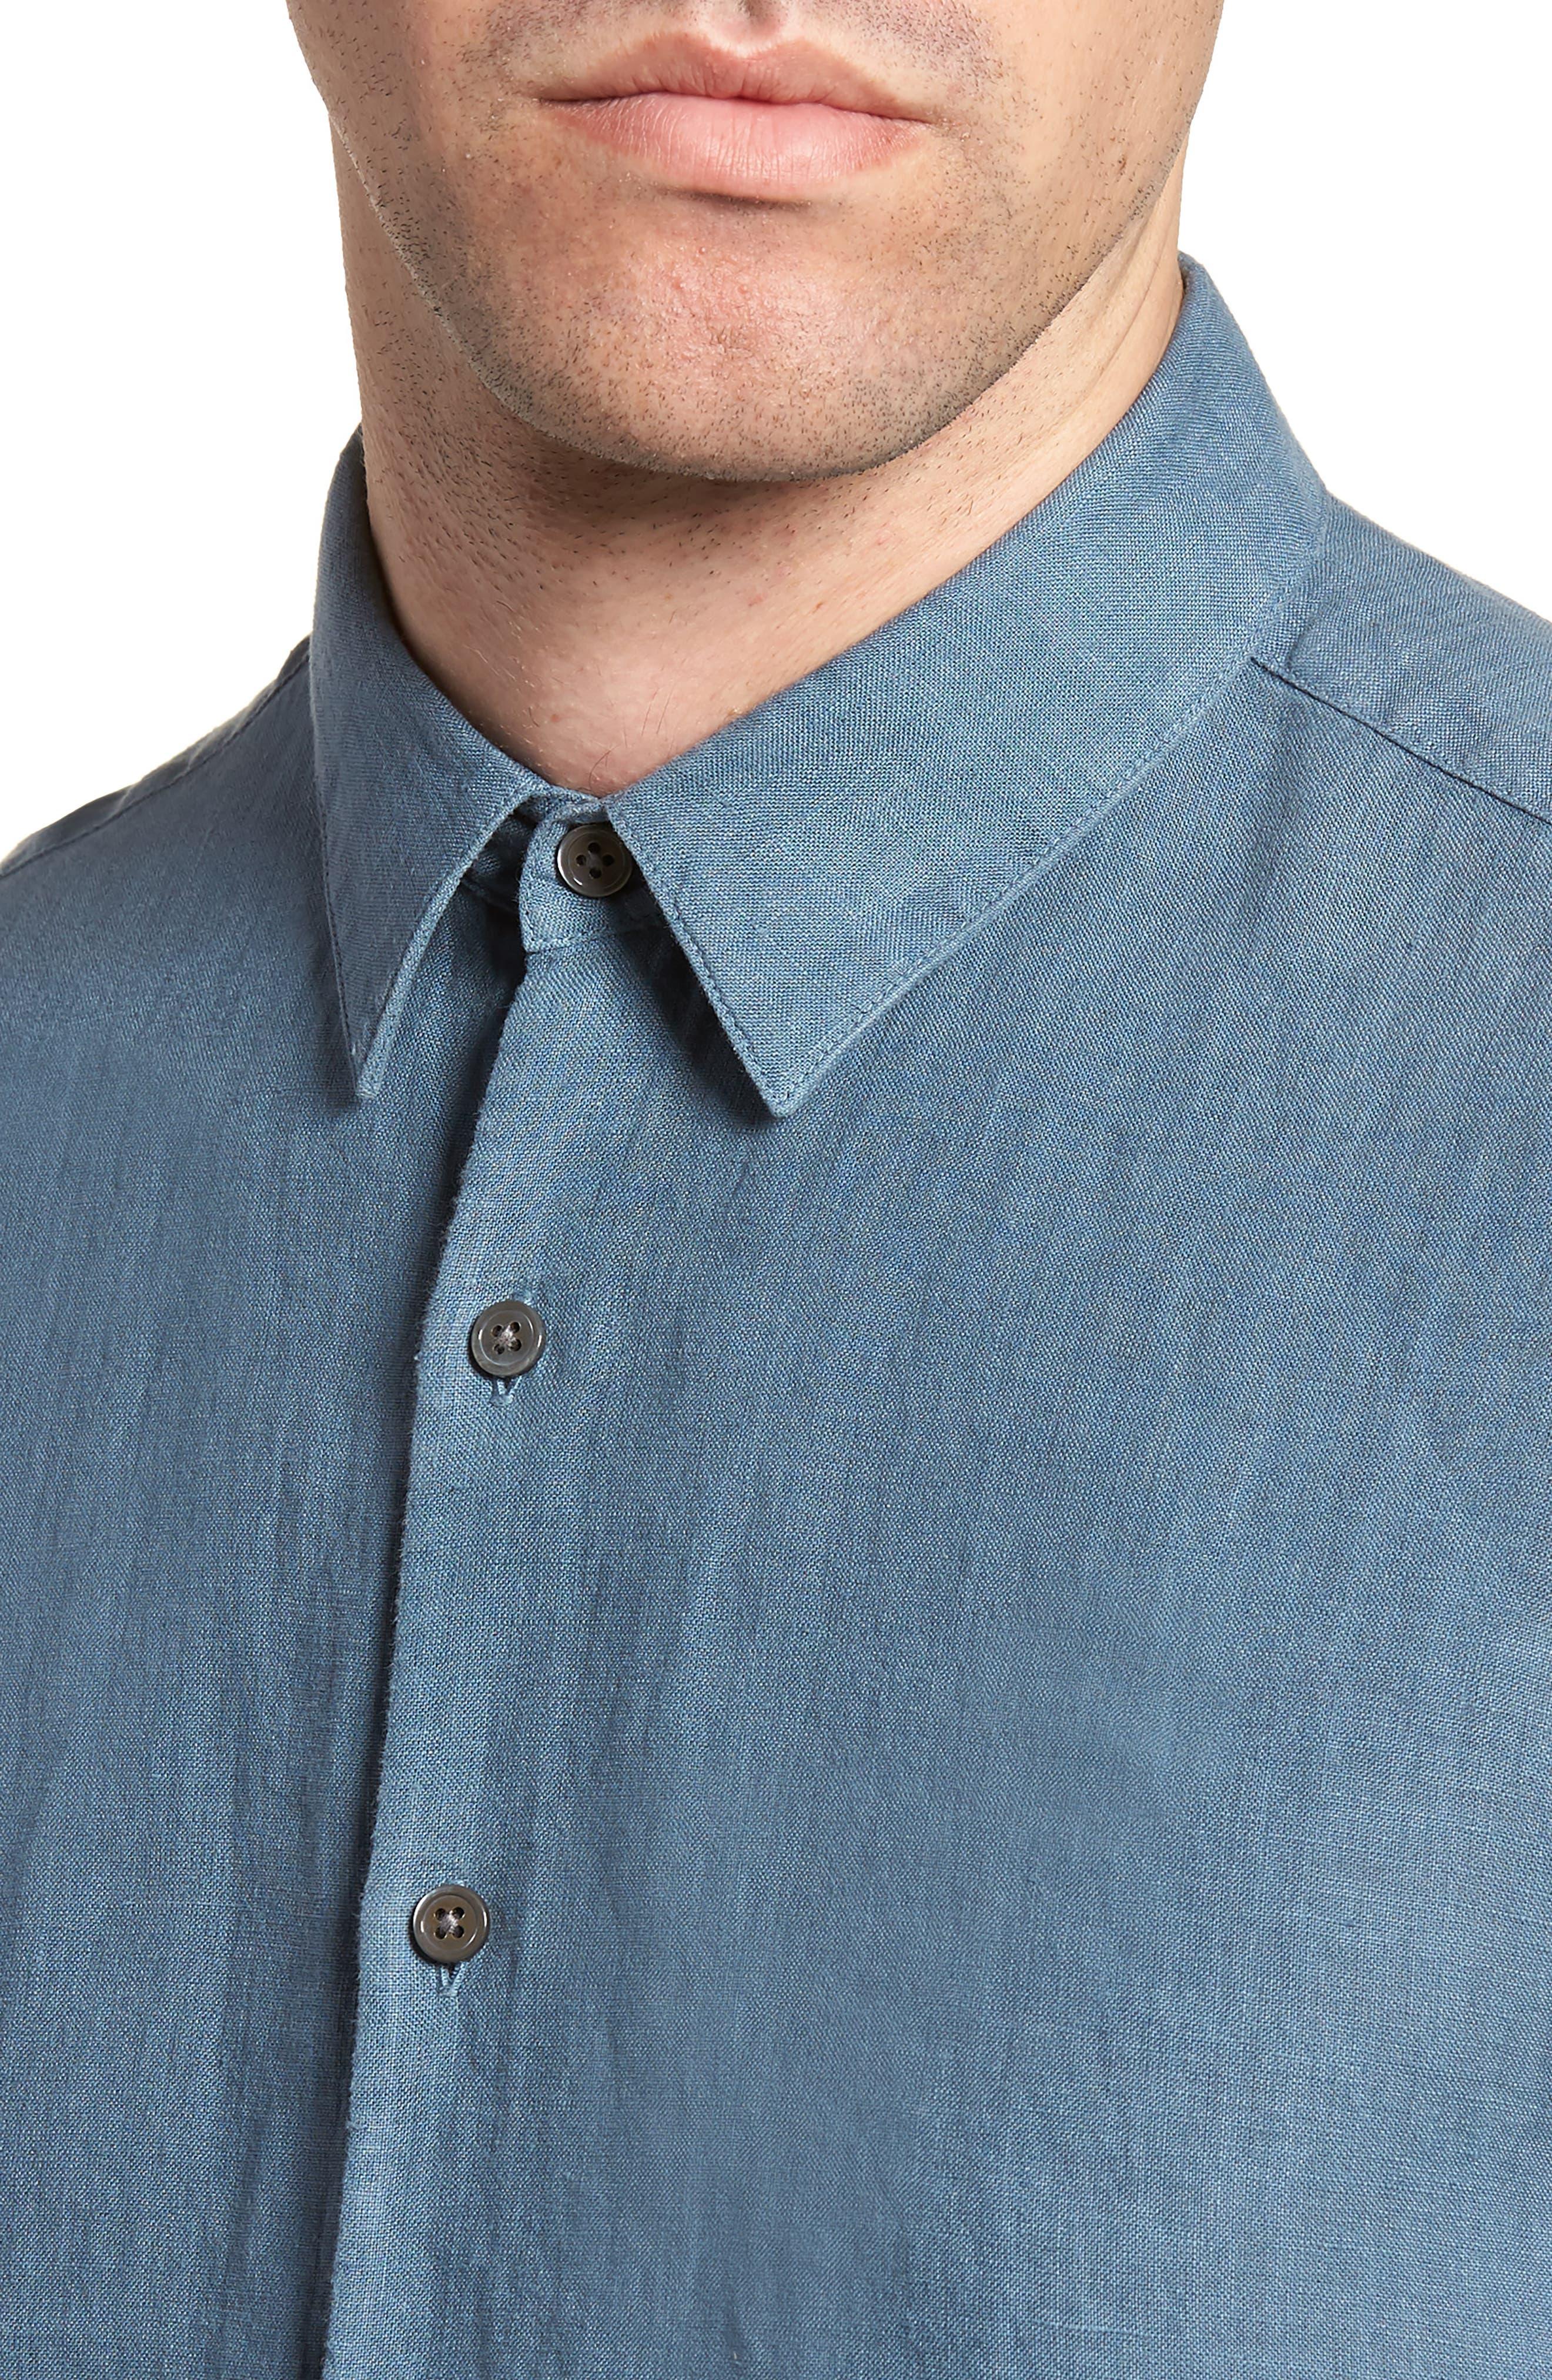 Irving Trim Fit Linen Short Sleeve Sport Shirt,                             Alternate thumbnail 4, color,                             Hydro